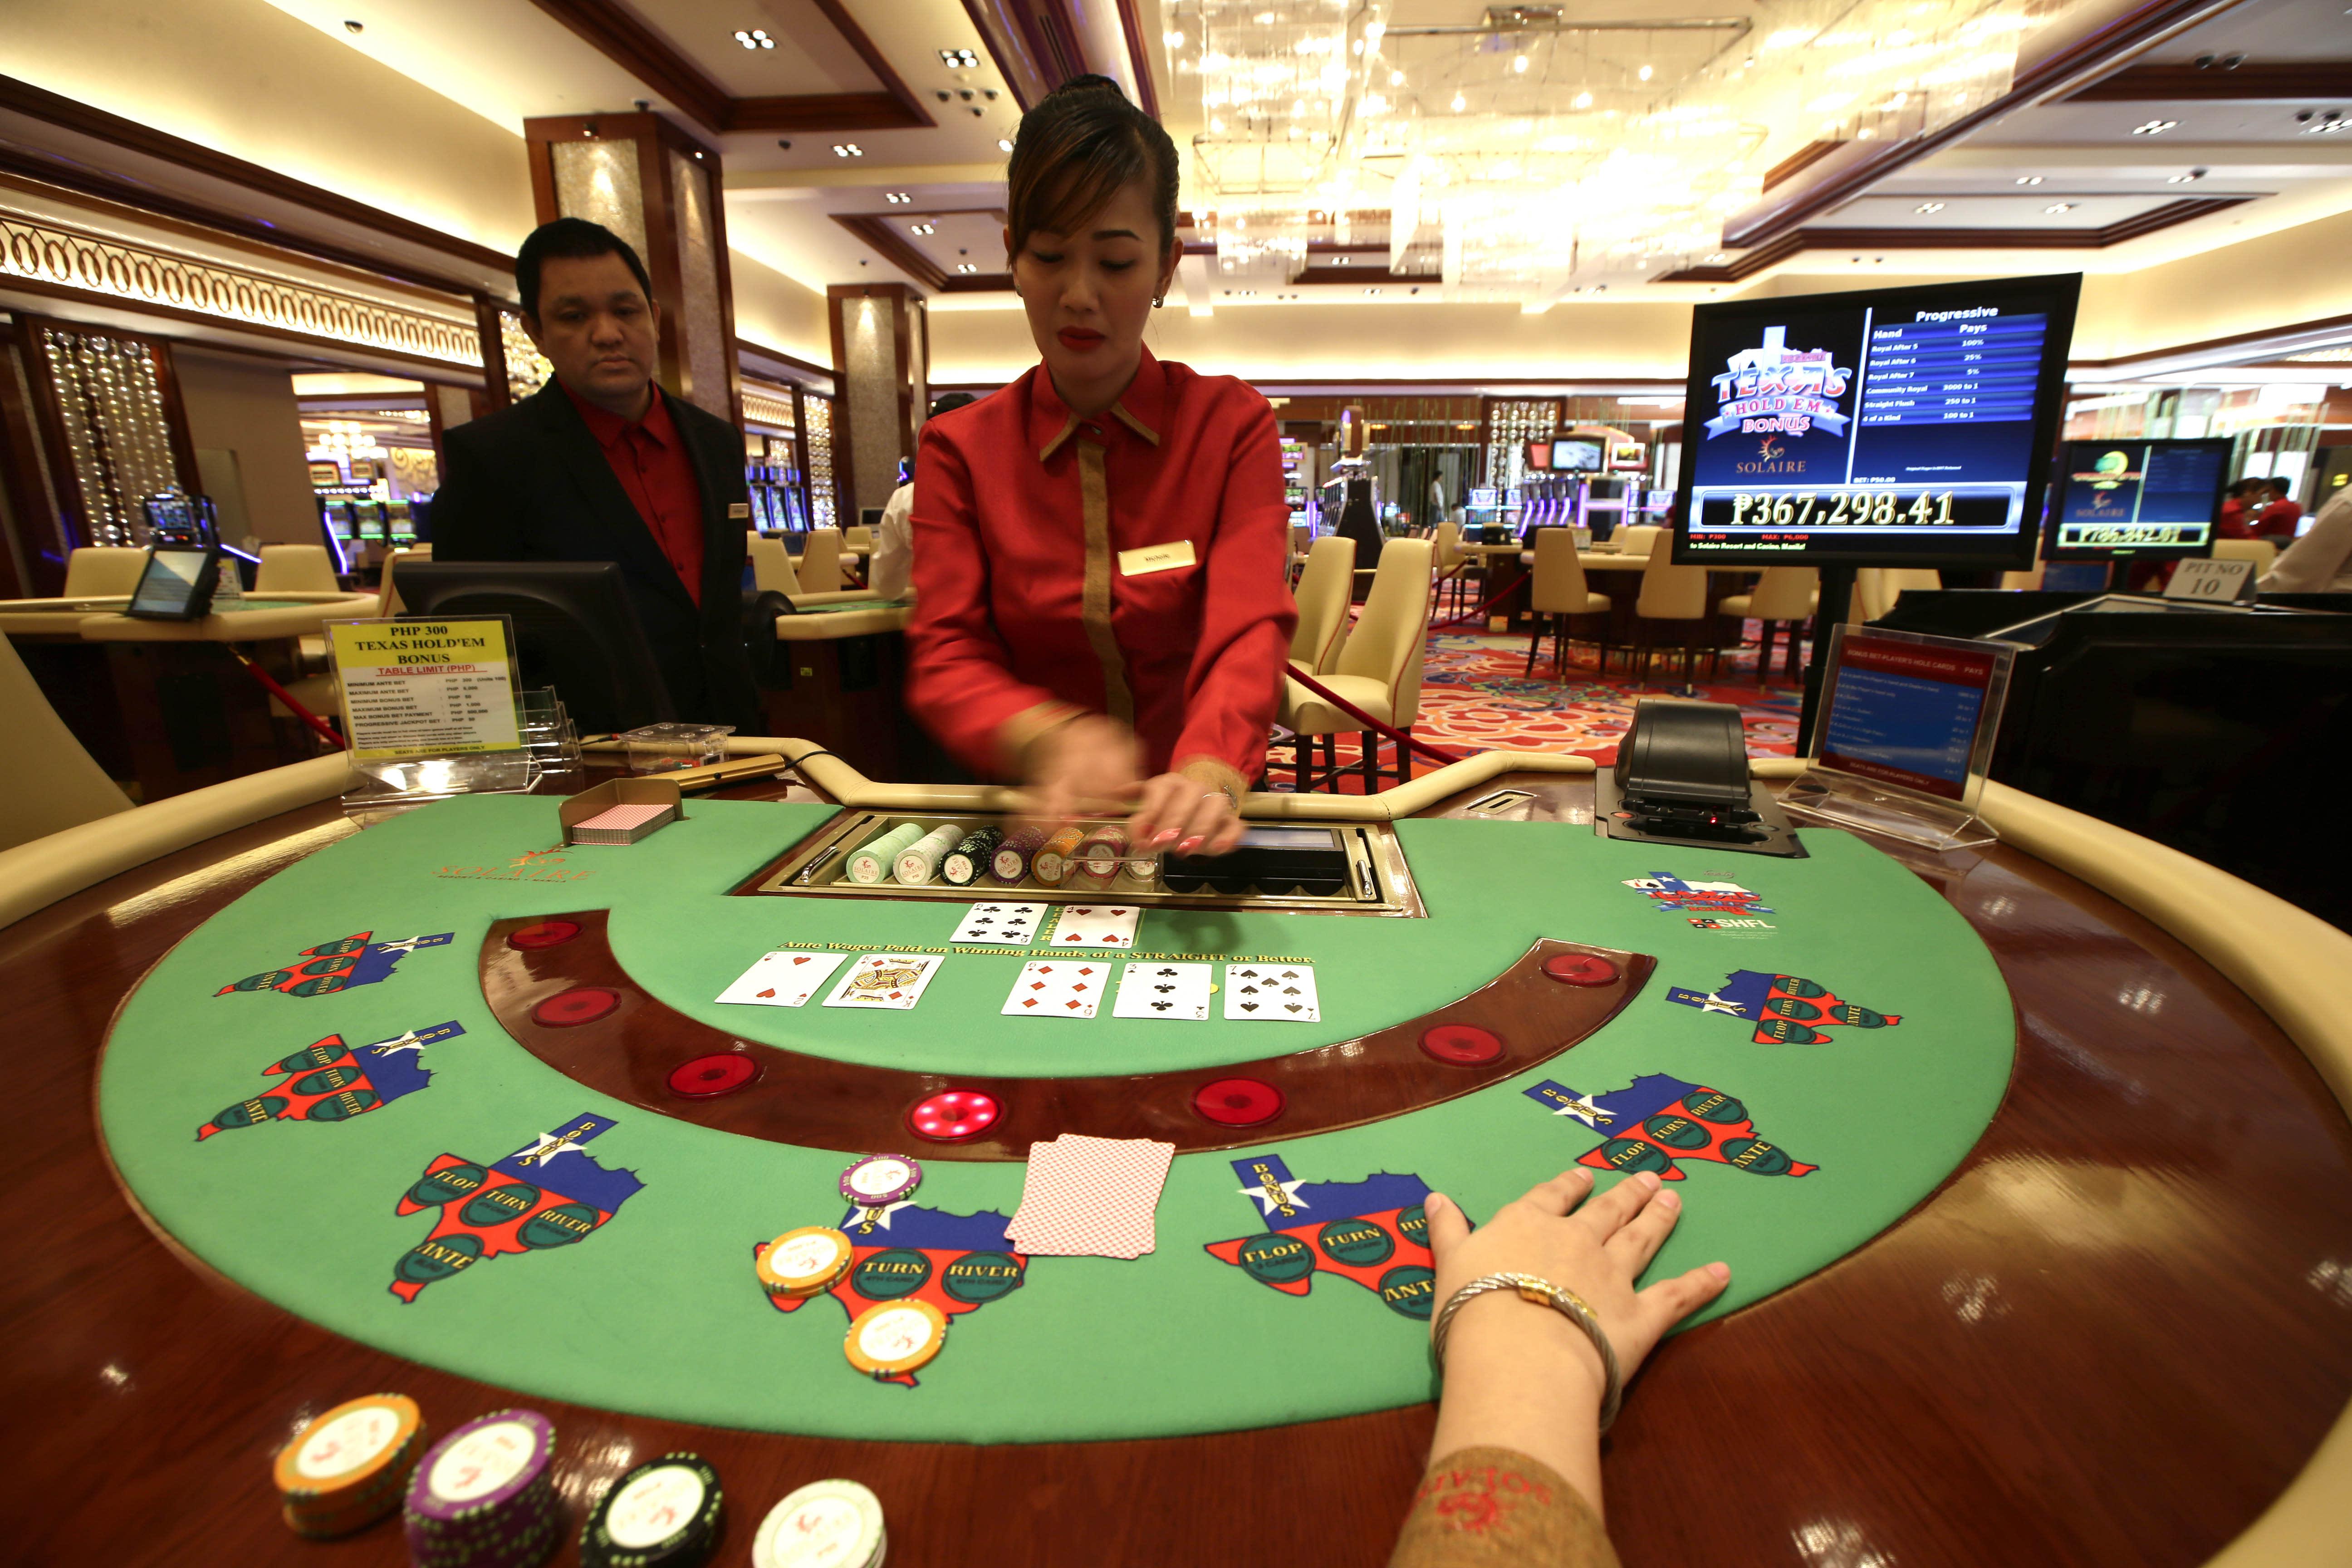 Philippines set to open $1 billion casino-resort